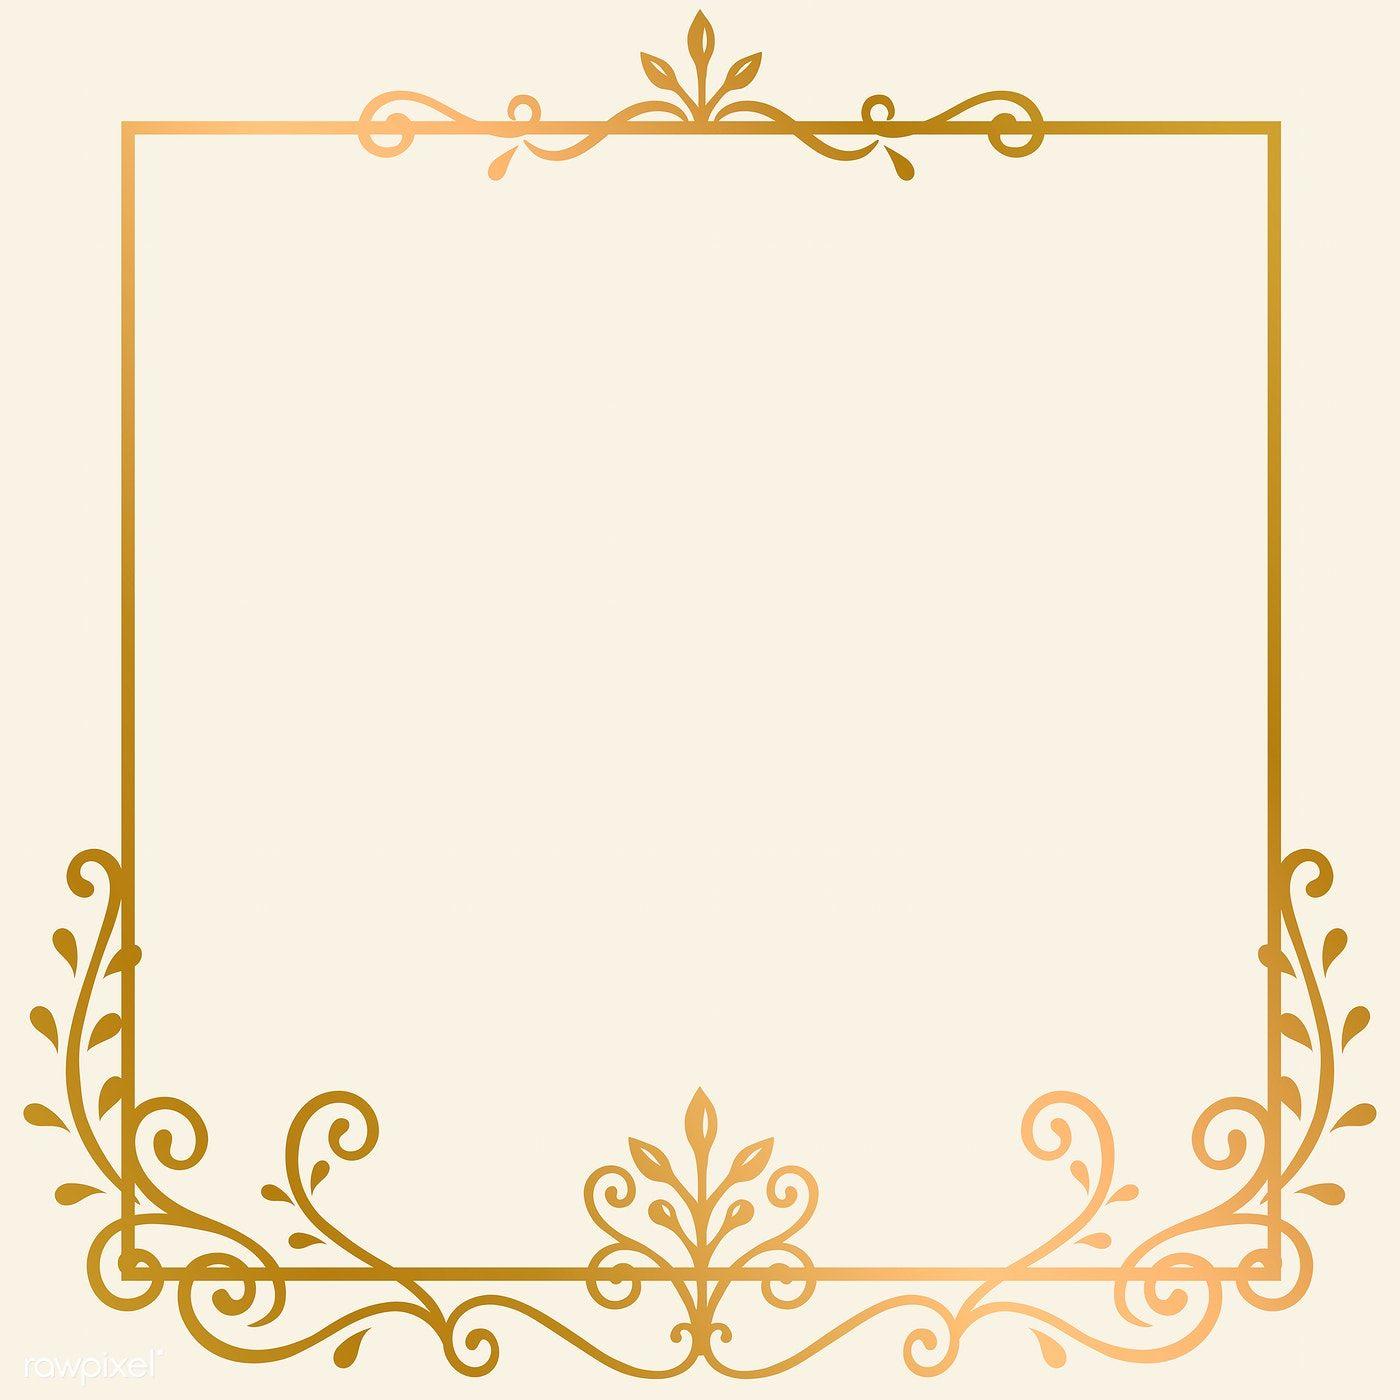 Golden Vintage Ornament Frame Vector Free Image By Rawpixel Com Filmful Ornament Frame Custom Wedding Monogram Vector Free